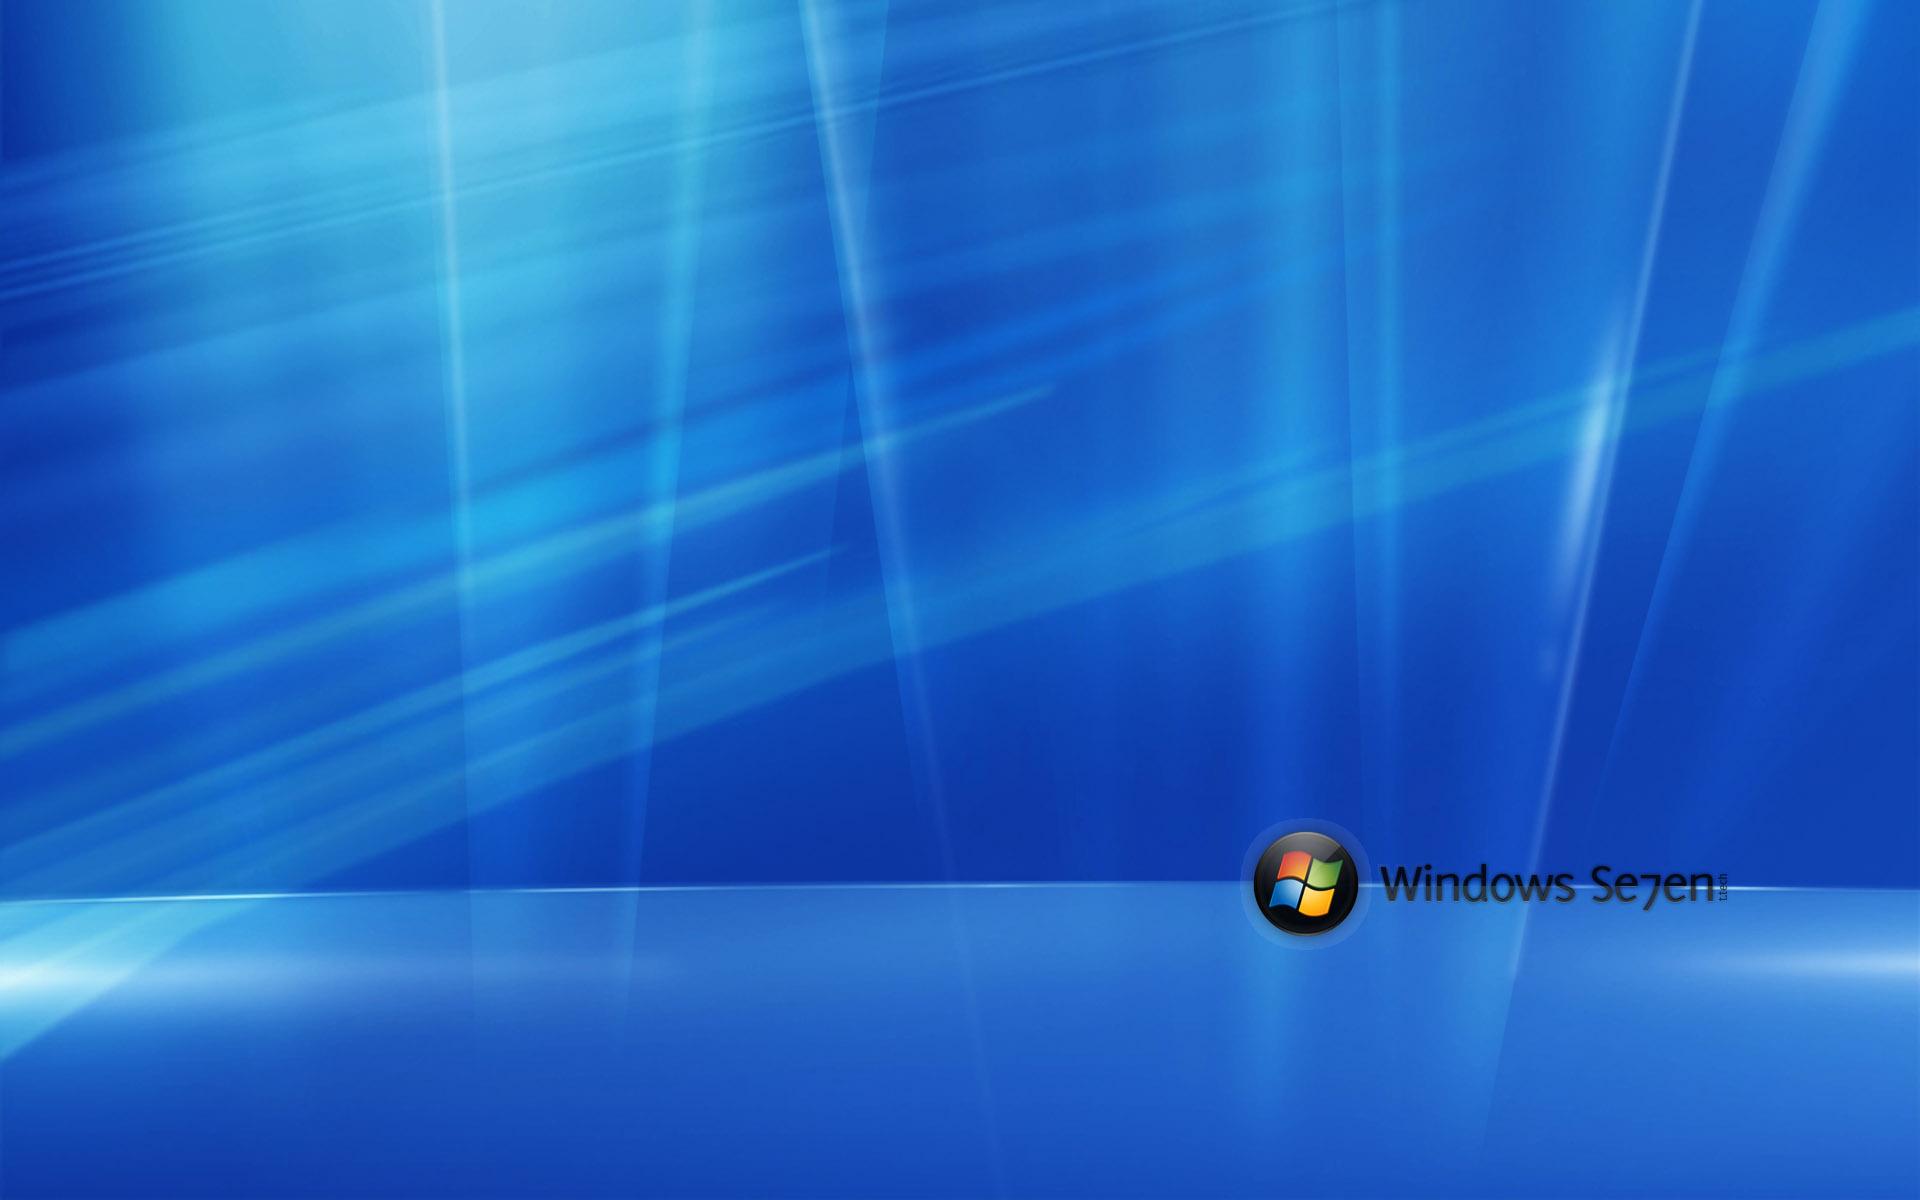 101 Unofficial Windows 7 Wallpaper WordPress Arena 1920x1200